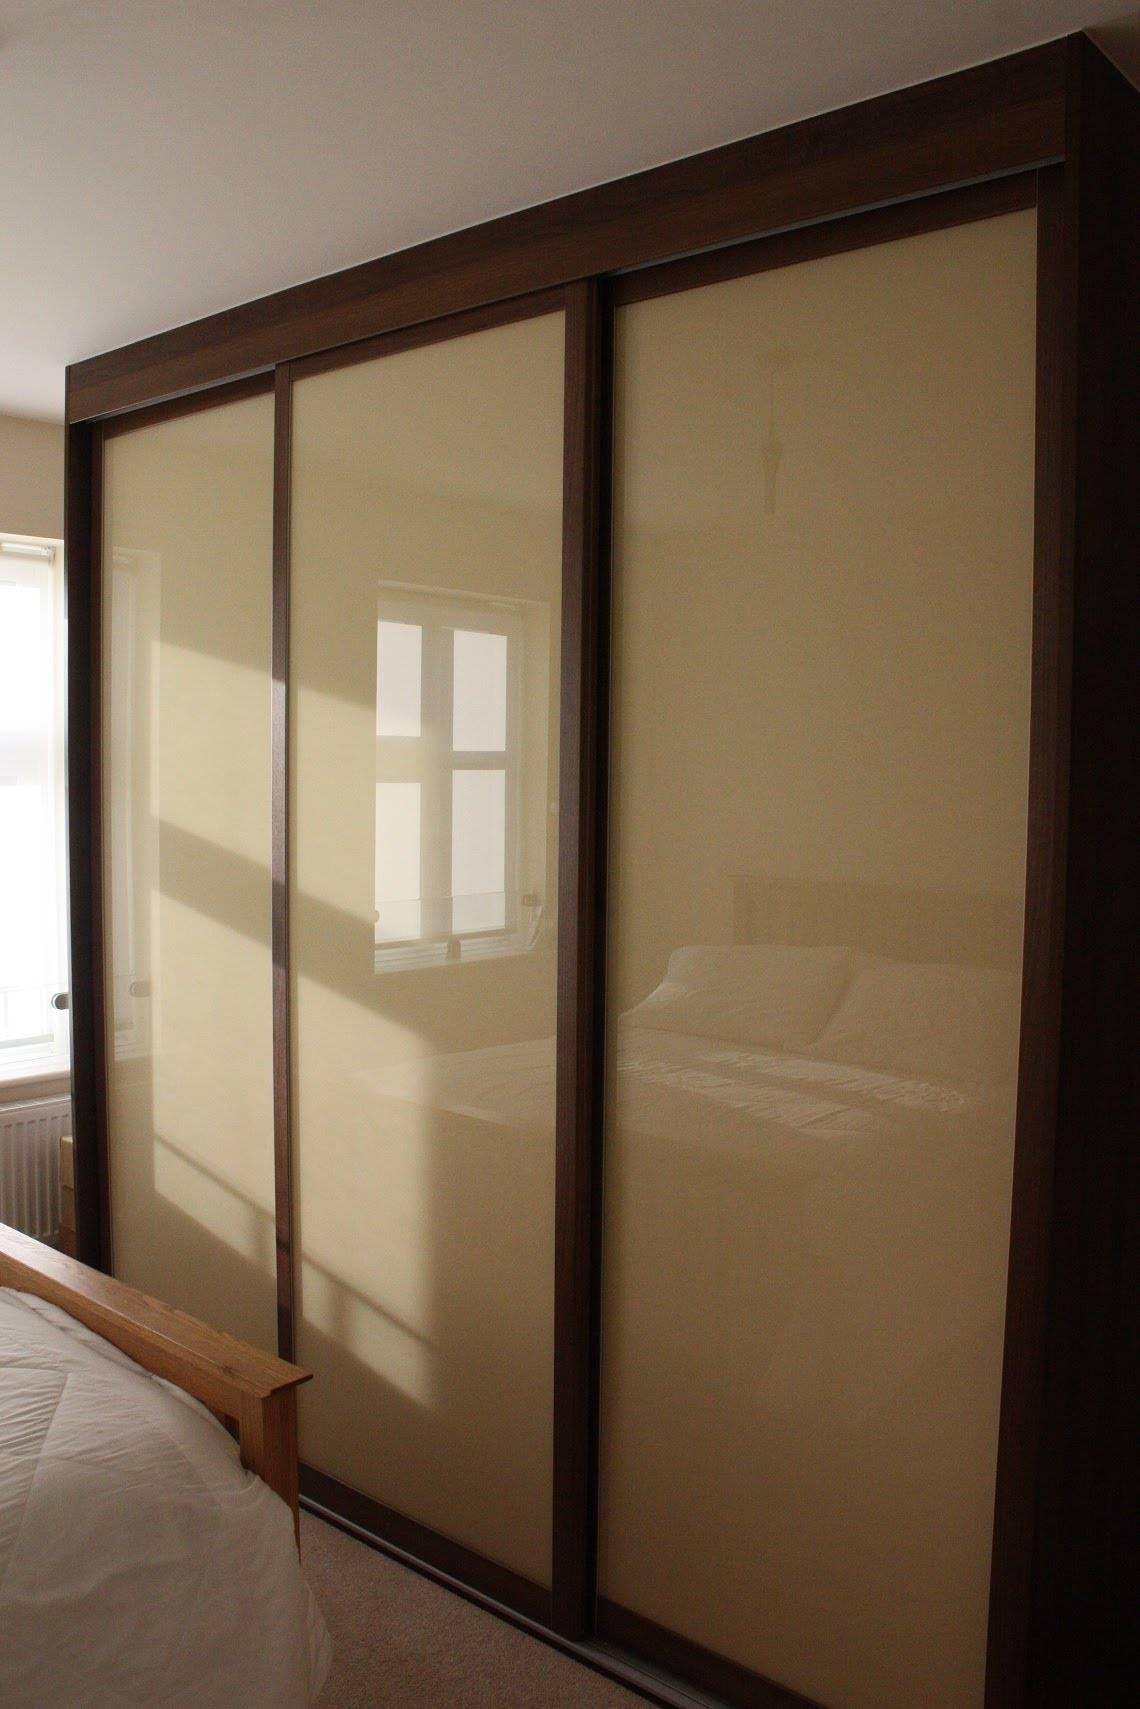 Irisstylform Semi Solid Oak Sliding Door Wardrobe. Mirrored intended for Dark Wood Wardrobe Doors (Image 17 of 30)